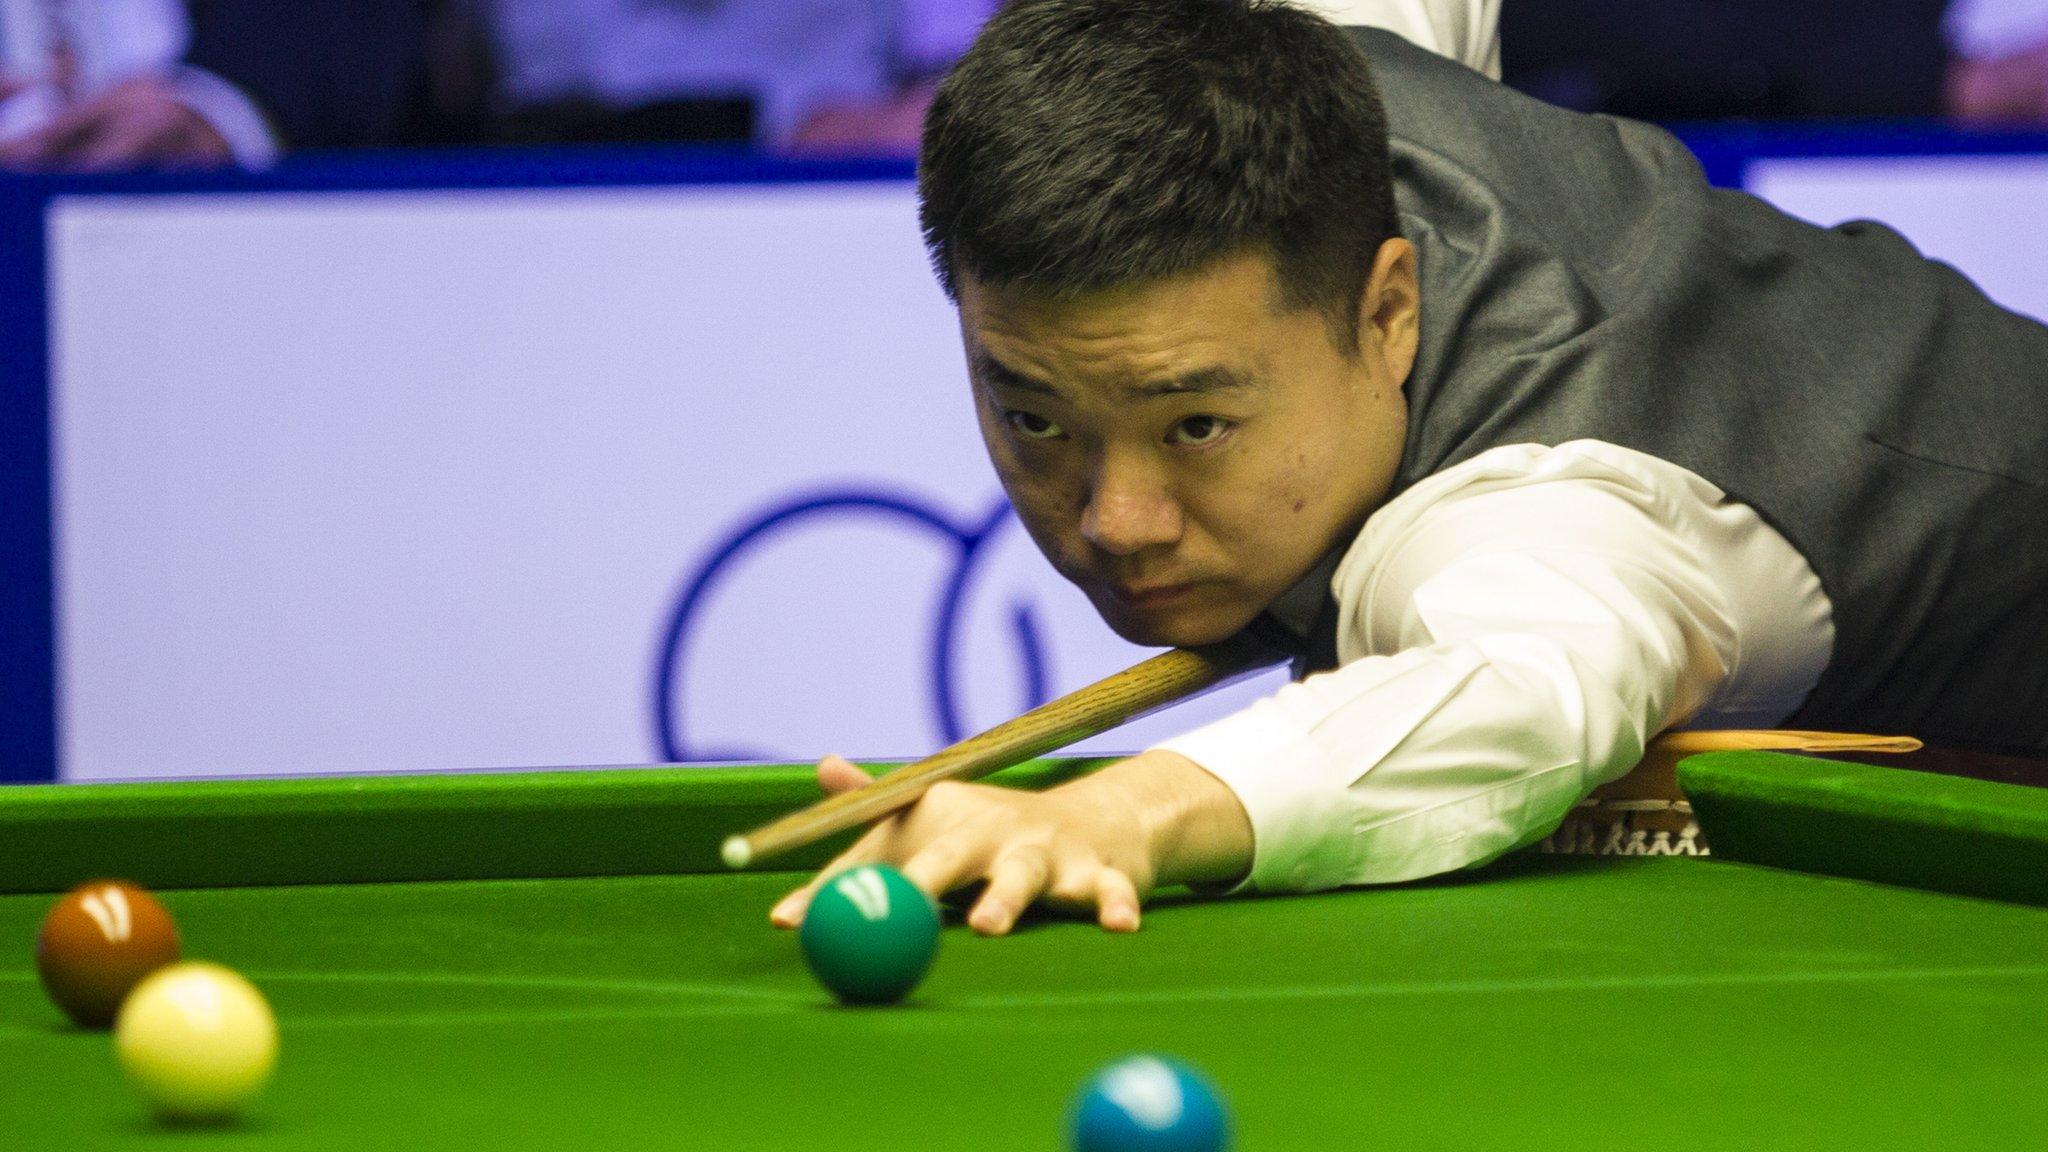 UK Championship: Ding Junhui repels Xiao Guodong fightback to progress